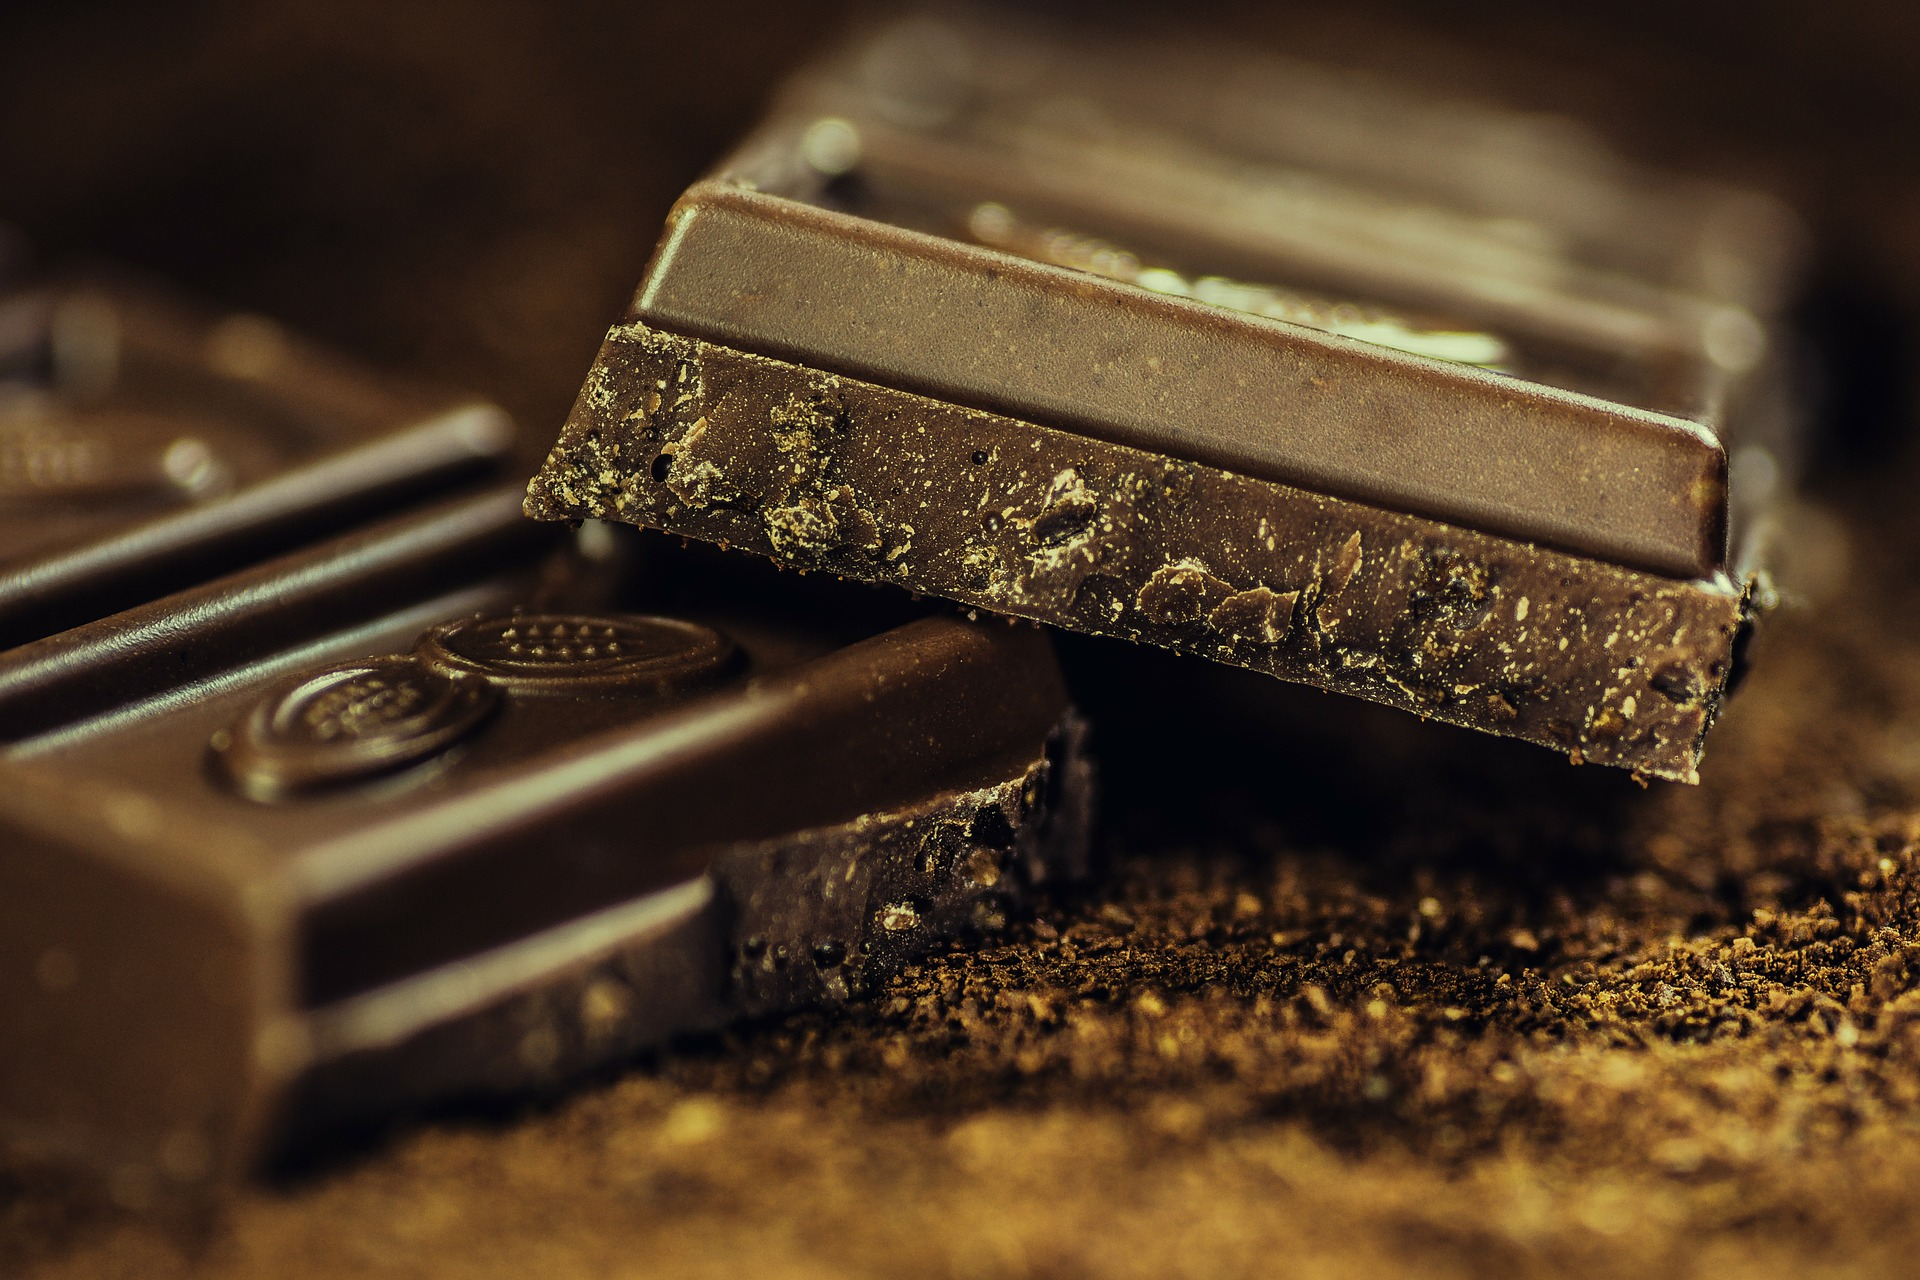 6547-cokolada.jpg